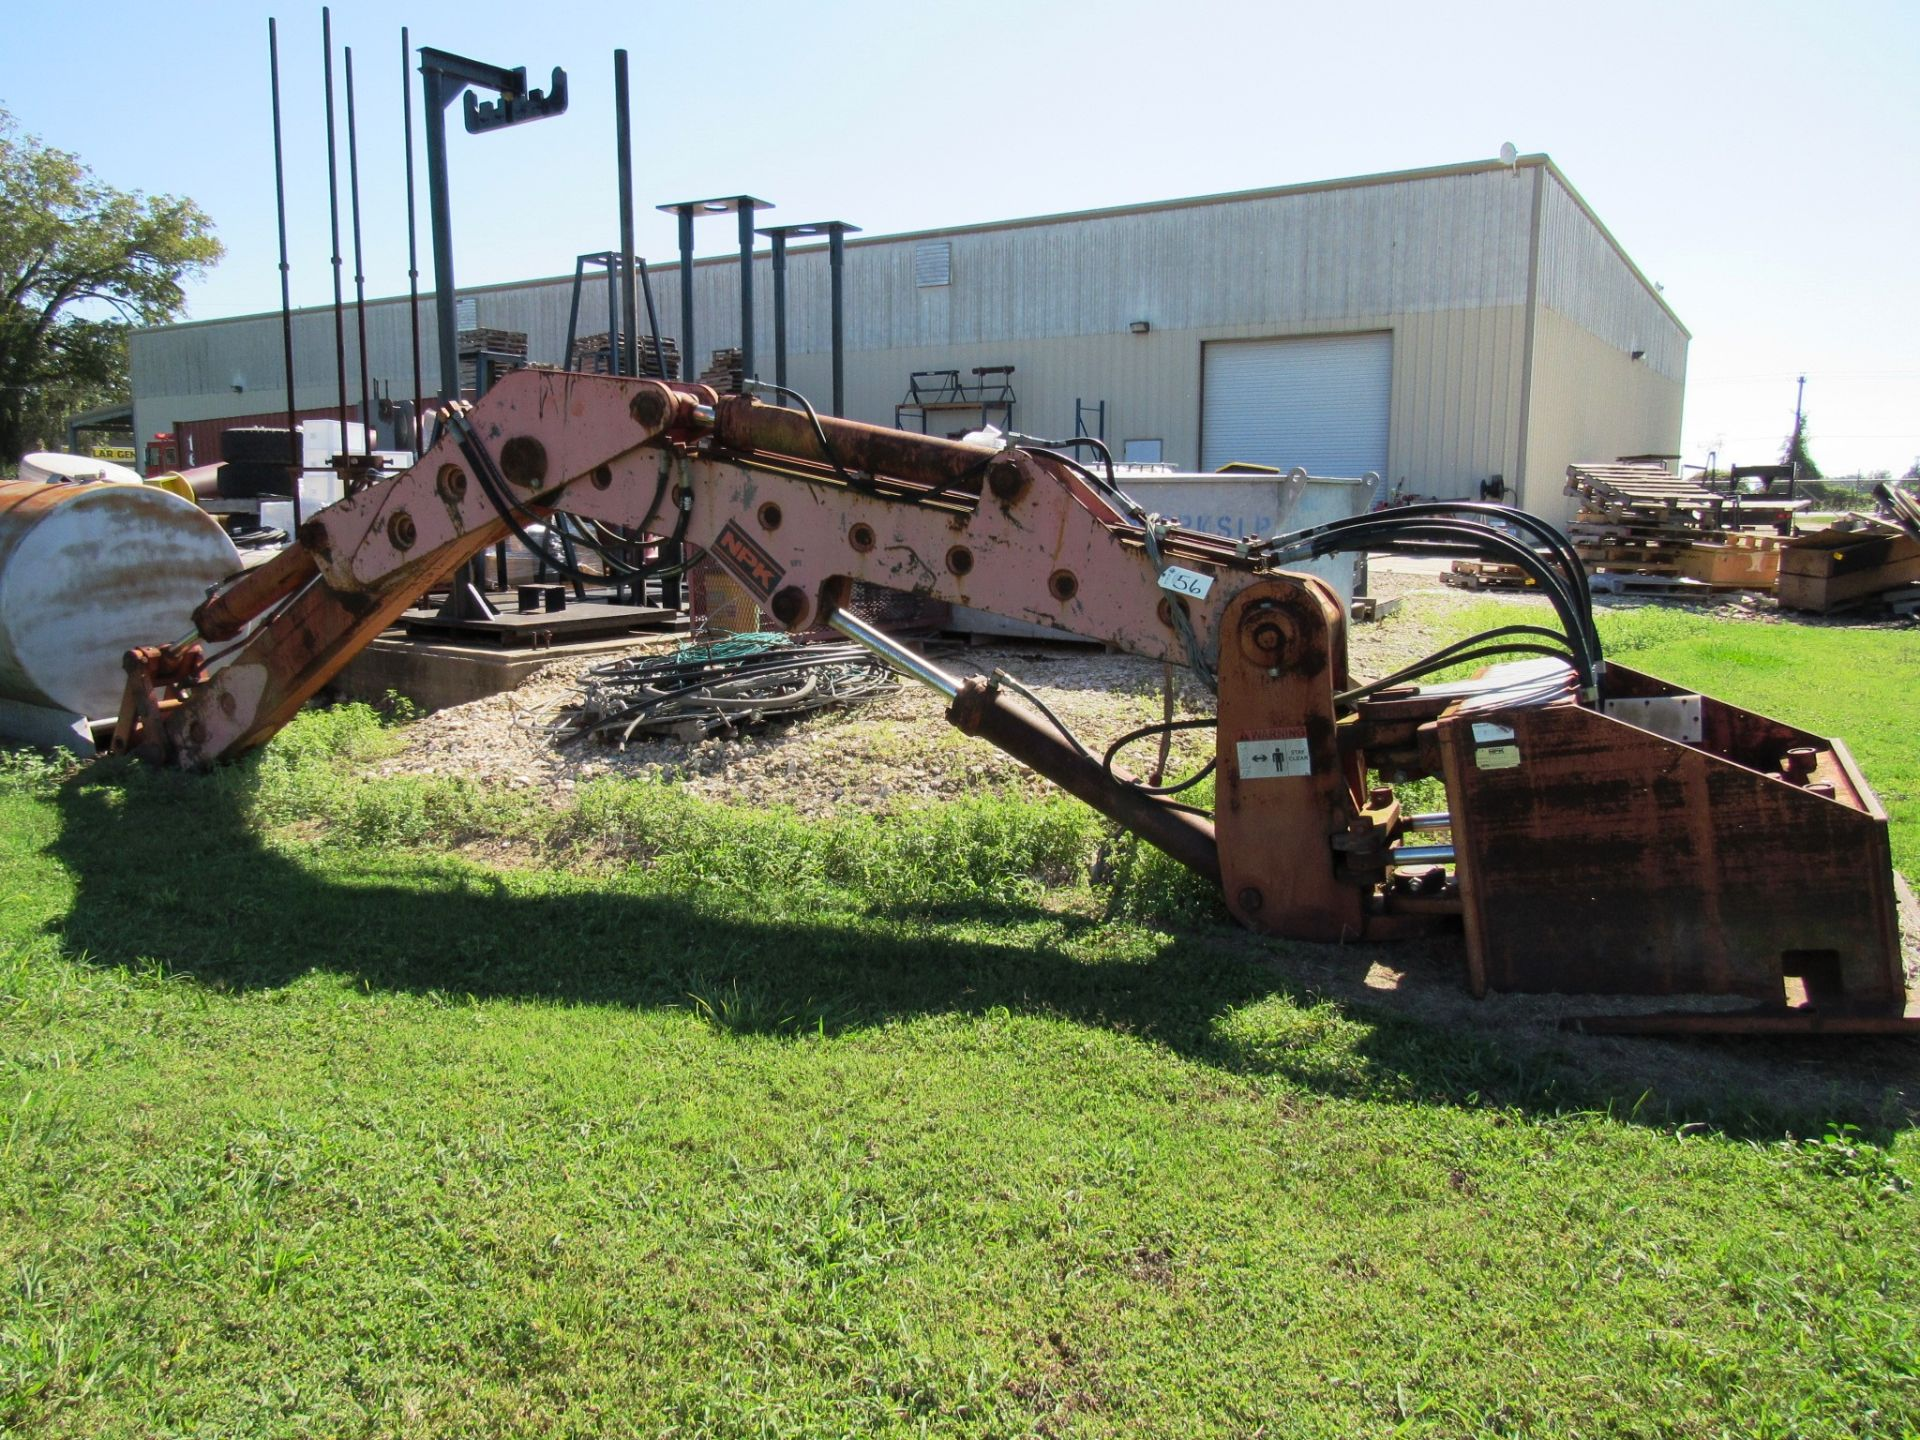 Lot 56 - NPK B600H Hydraulic Pedestal Boom & Backhoe Attachment, sn:1N6201